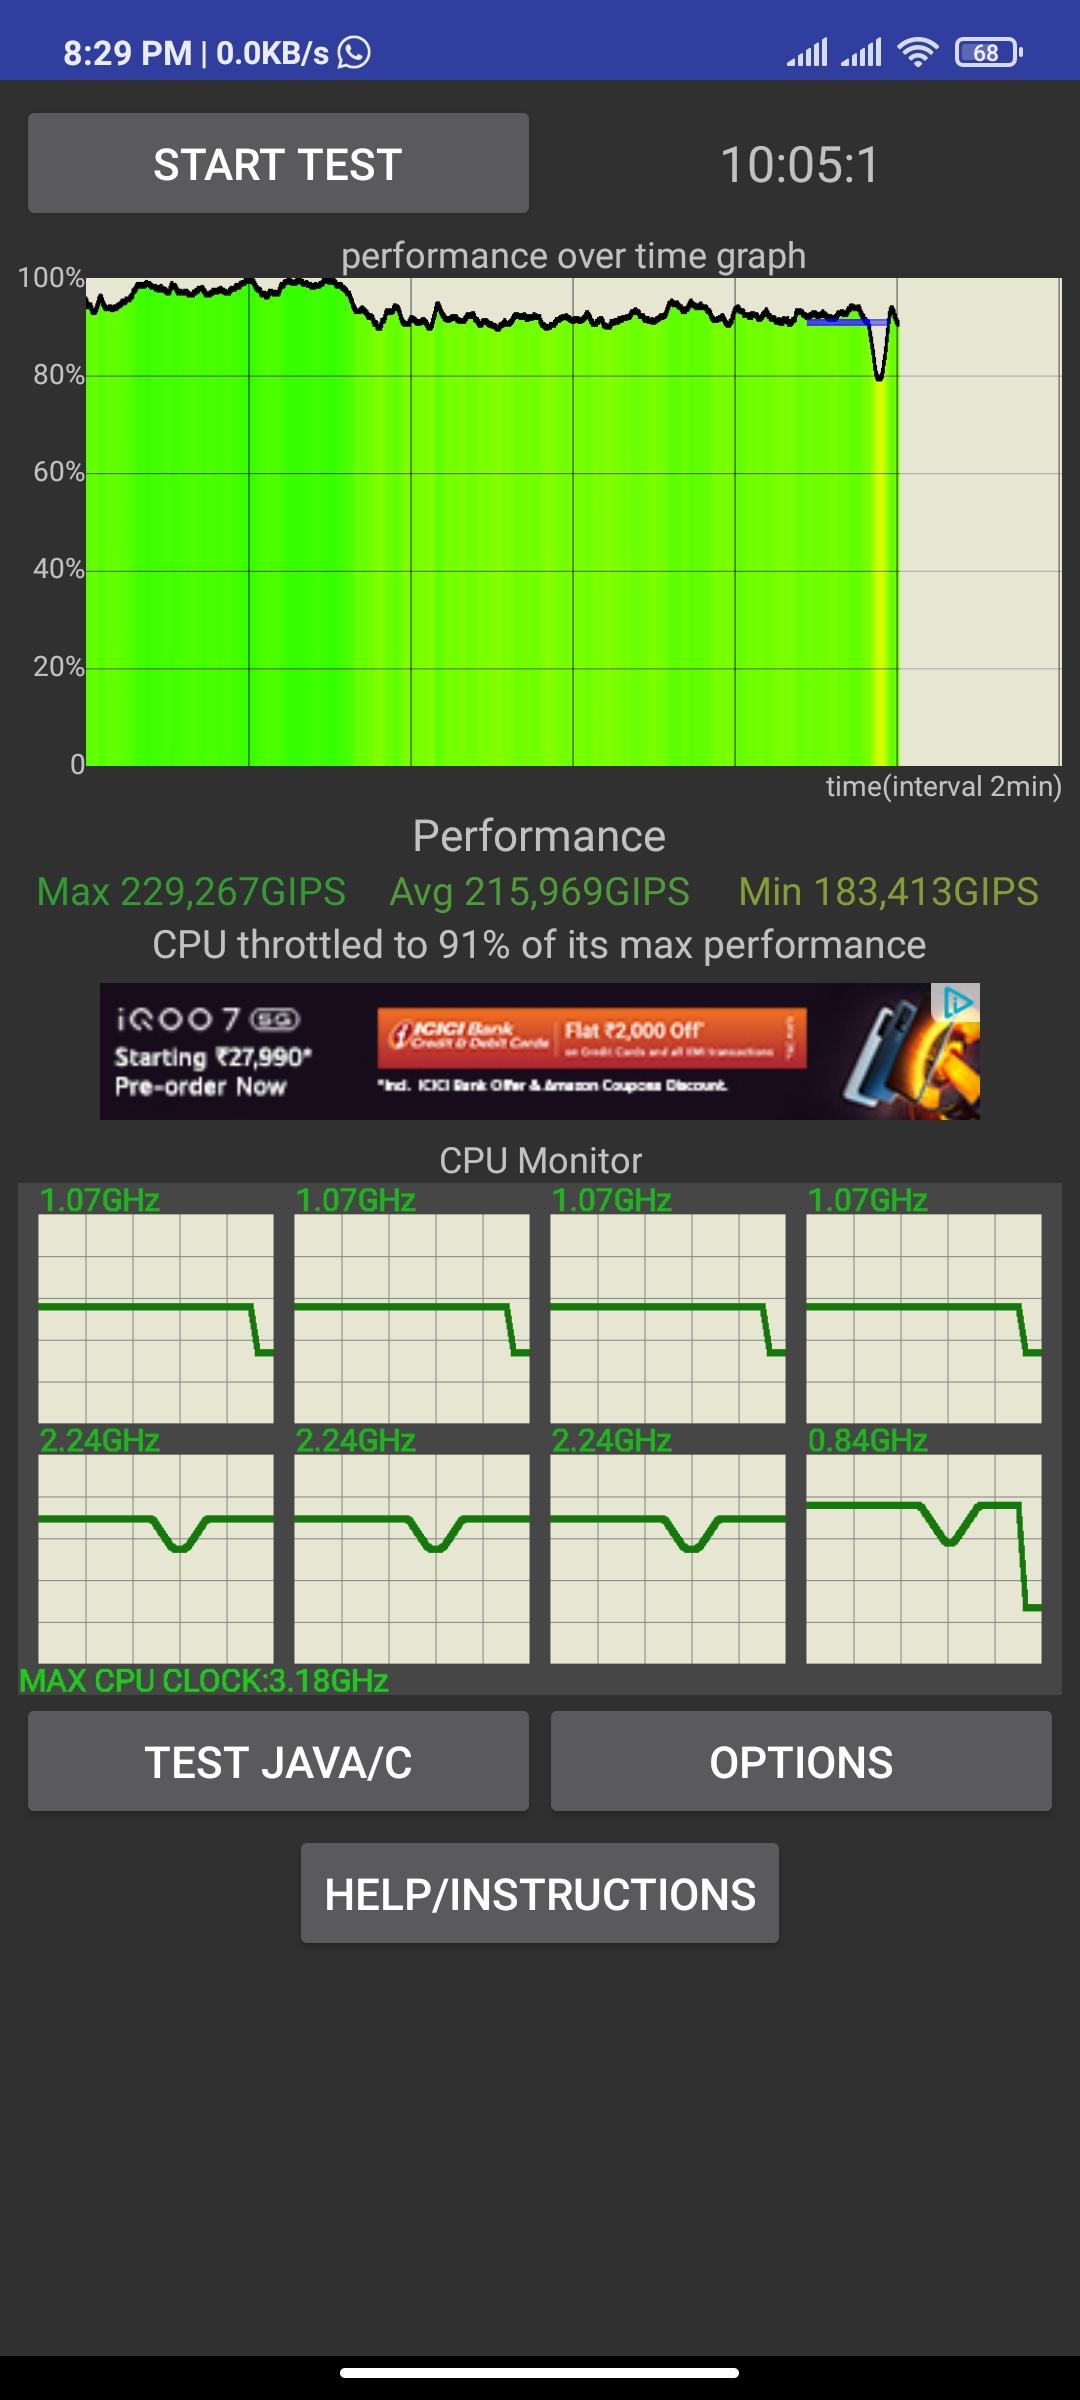 Screenshot_2021-05-09-20-29-55-439_skynet.cputhrottlingtest.jpg